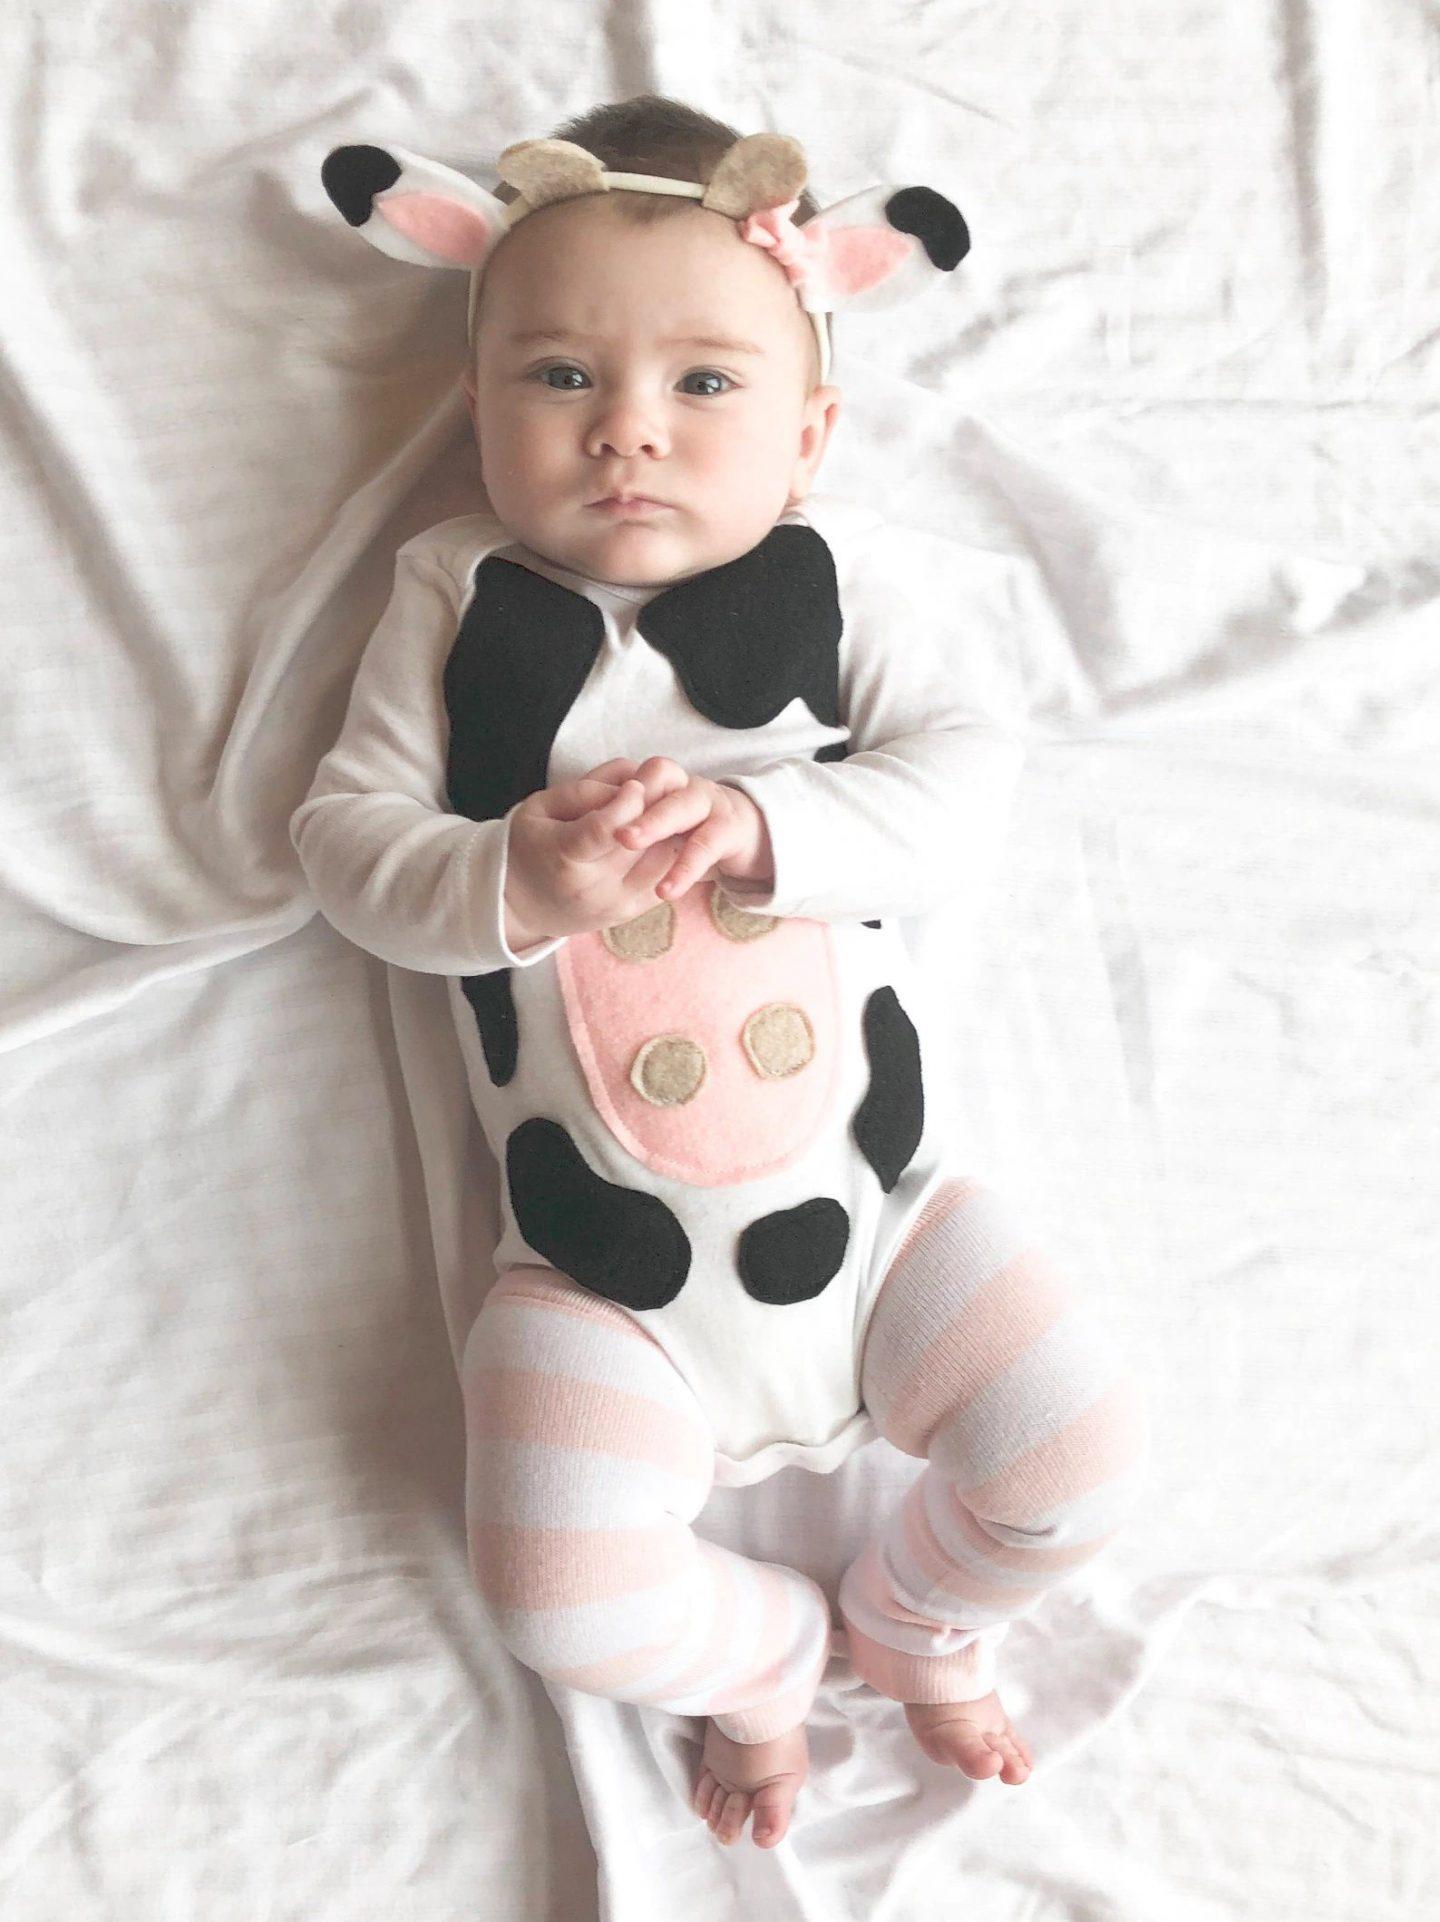 Cow Halloween costume for newborns